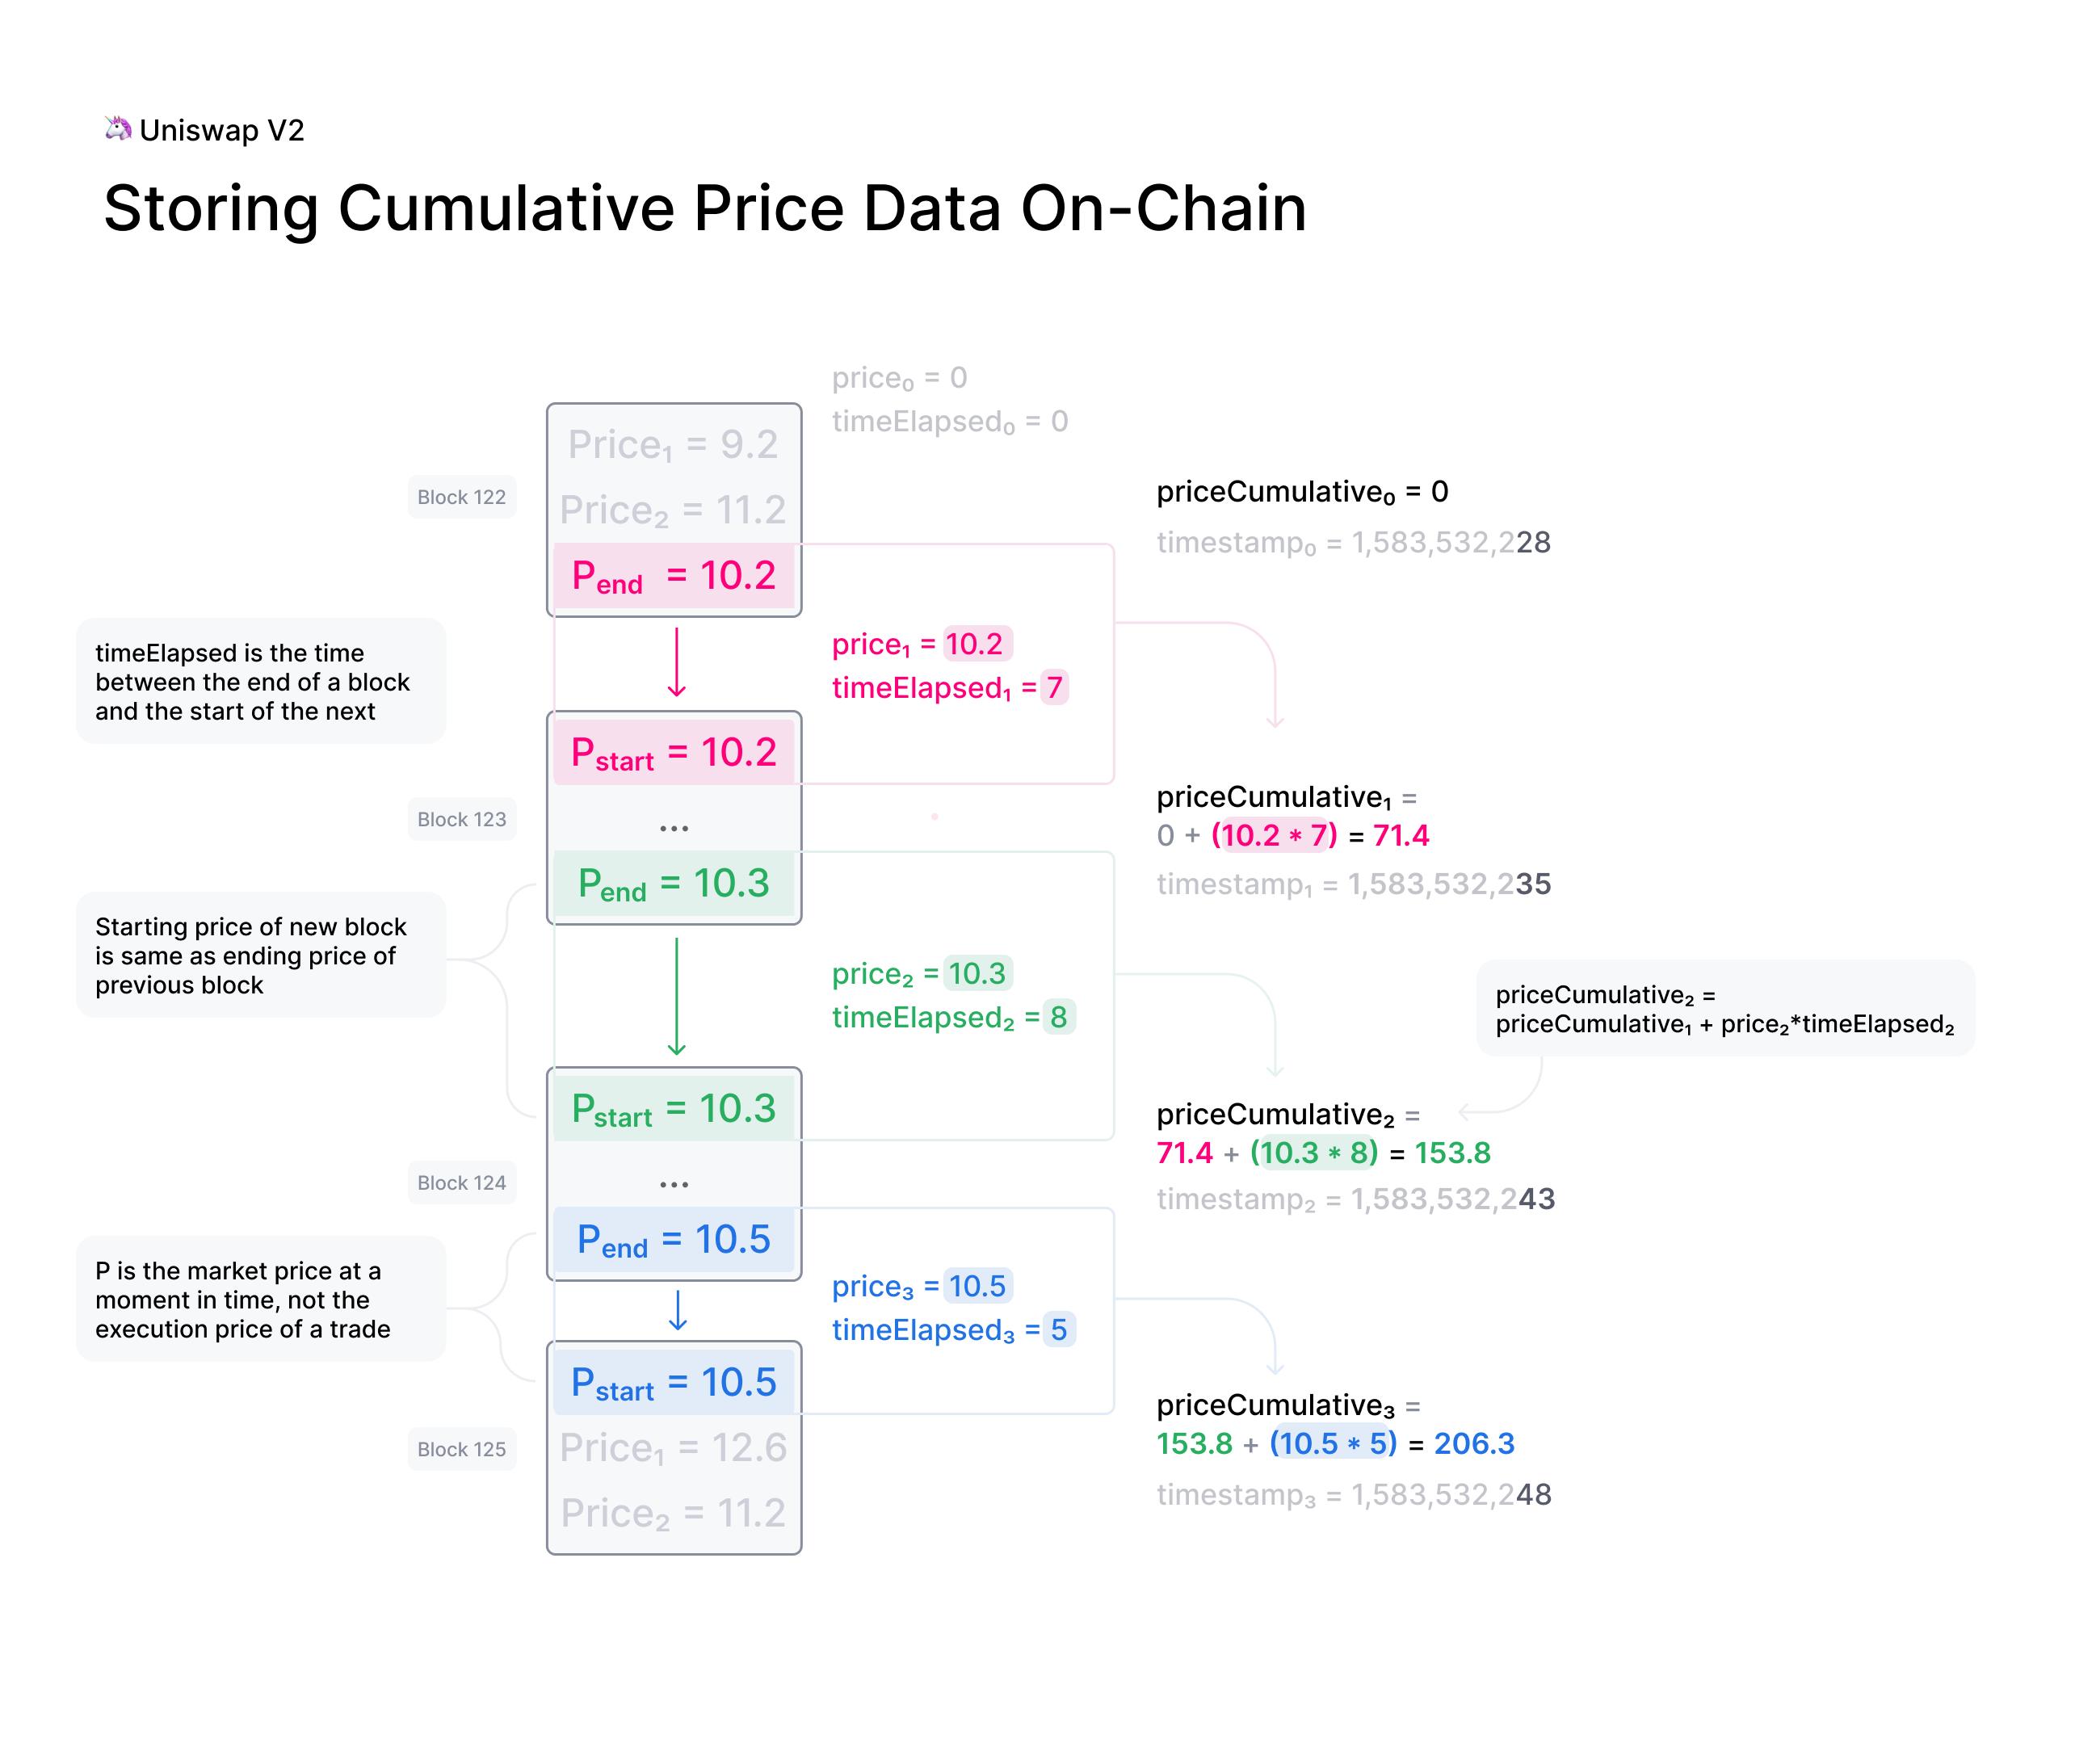 Storing Cumulative Price Data On-Chain